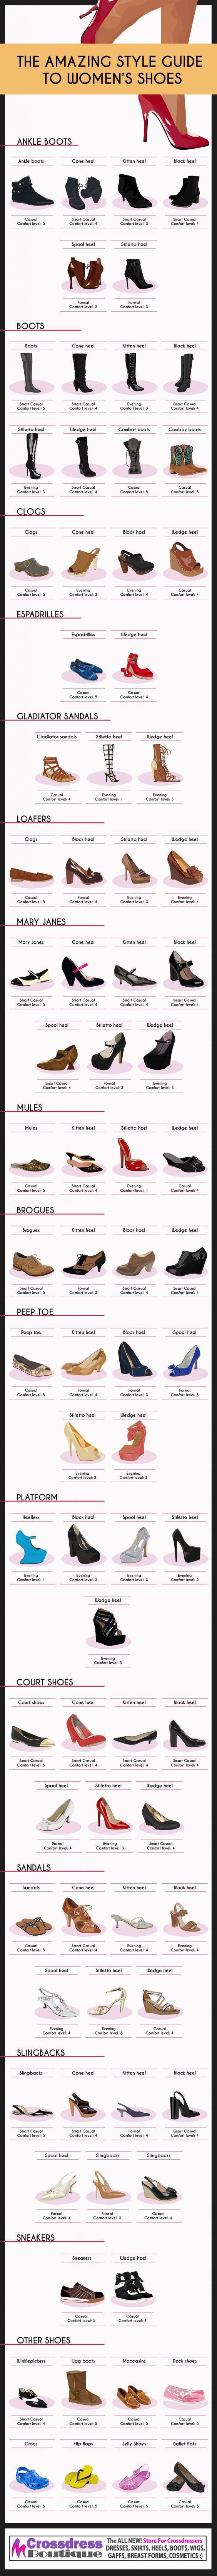 The crossdresser style guide to all types of footwear. http://www.crossdressboutique.com/tgirl/shoes-boots-hosiery/